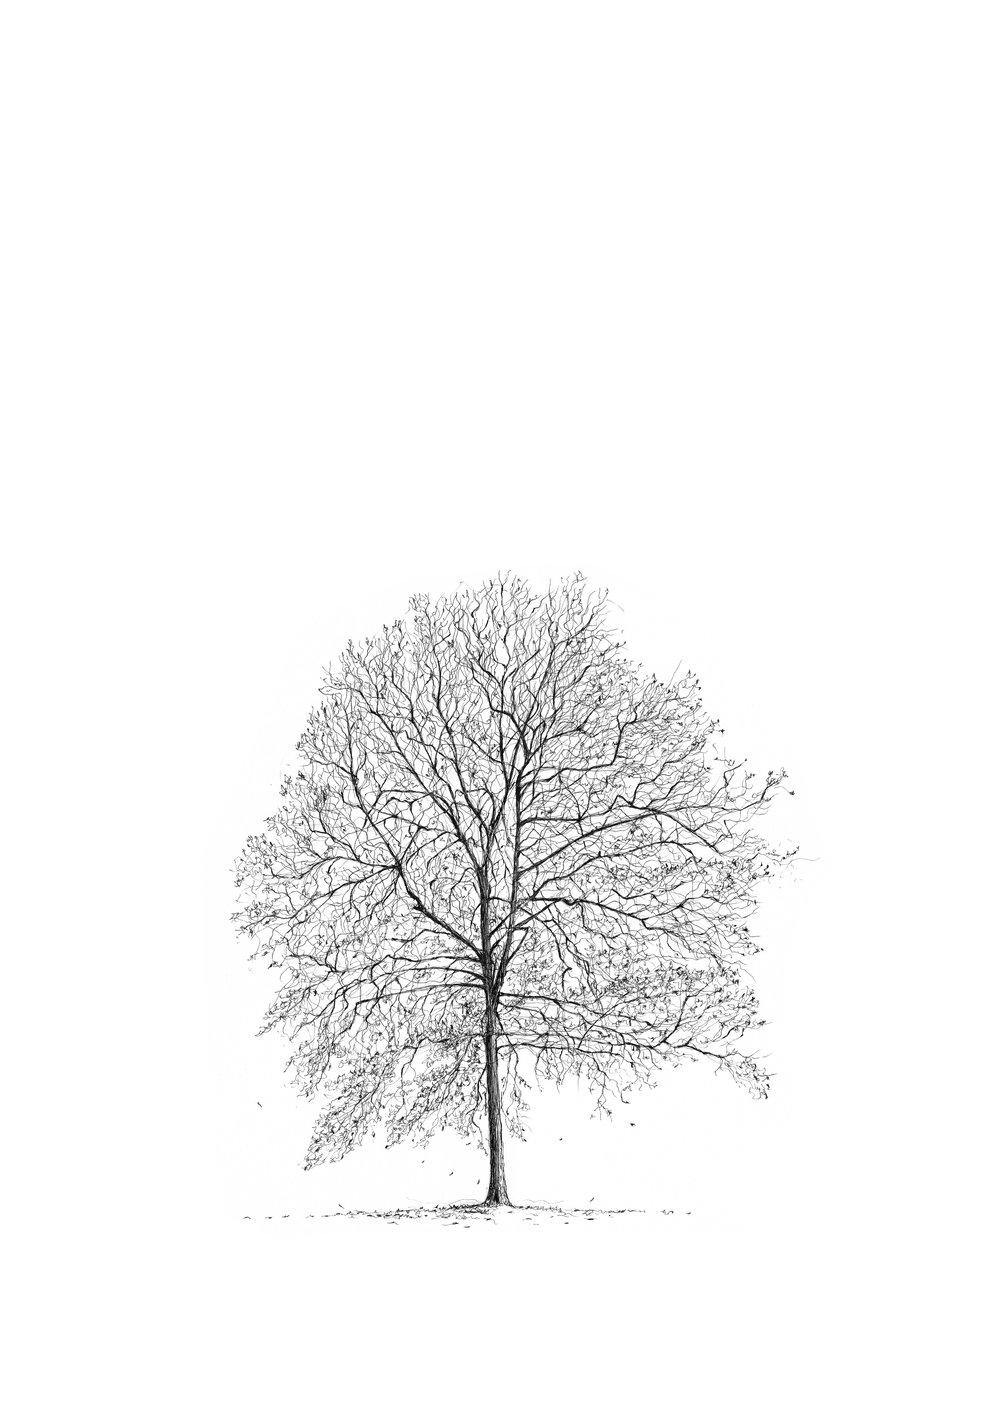 GREENWICH PARK SHAGBARK HICKORY - Luke Adam Hawker